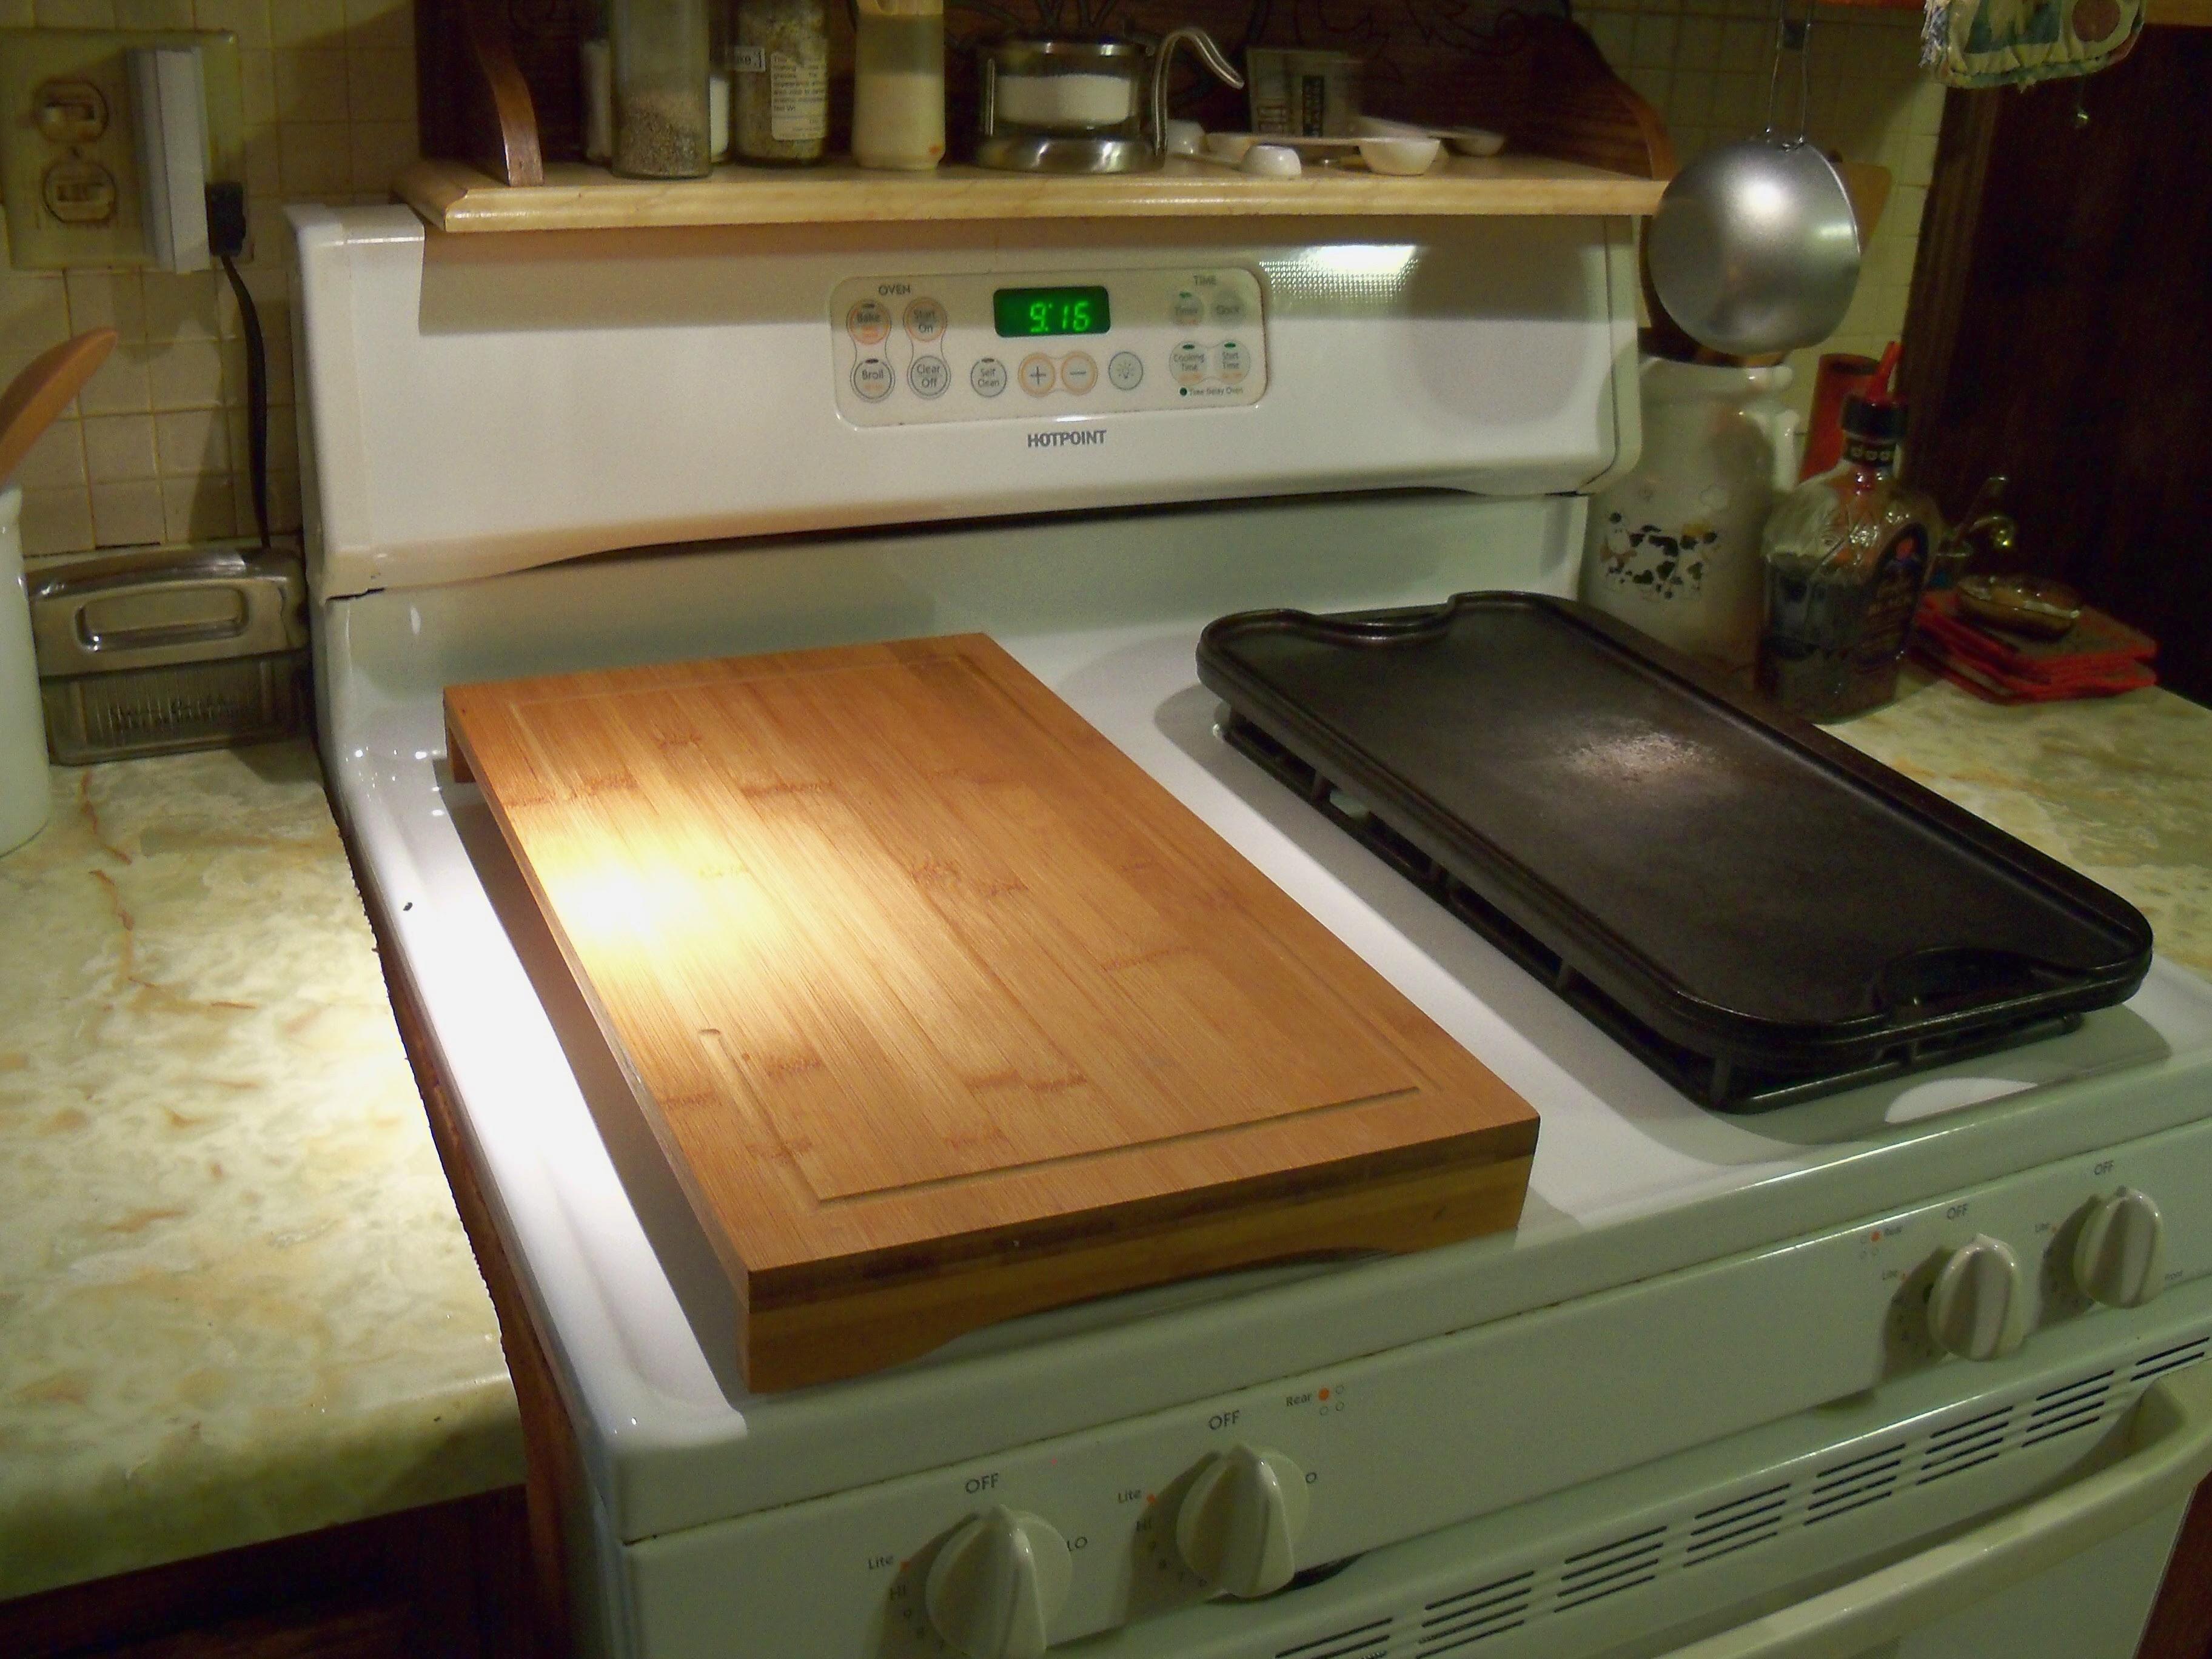 Kitchen Stove Covers Modern Design